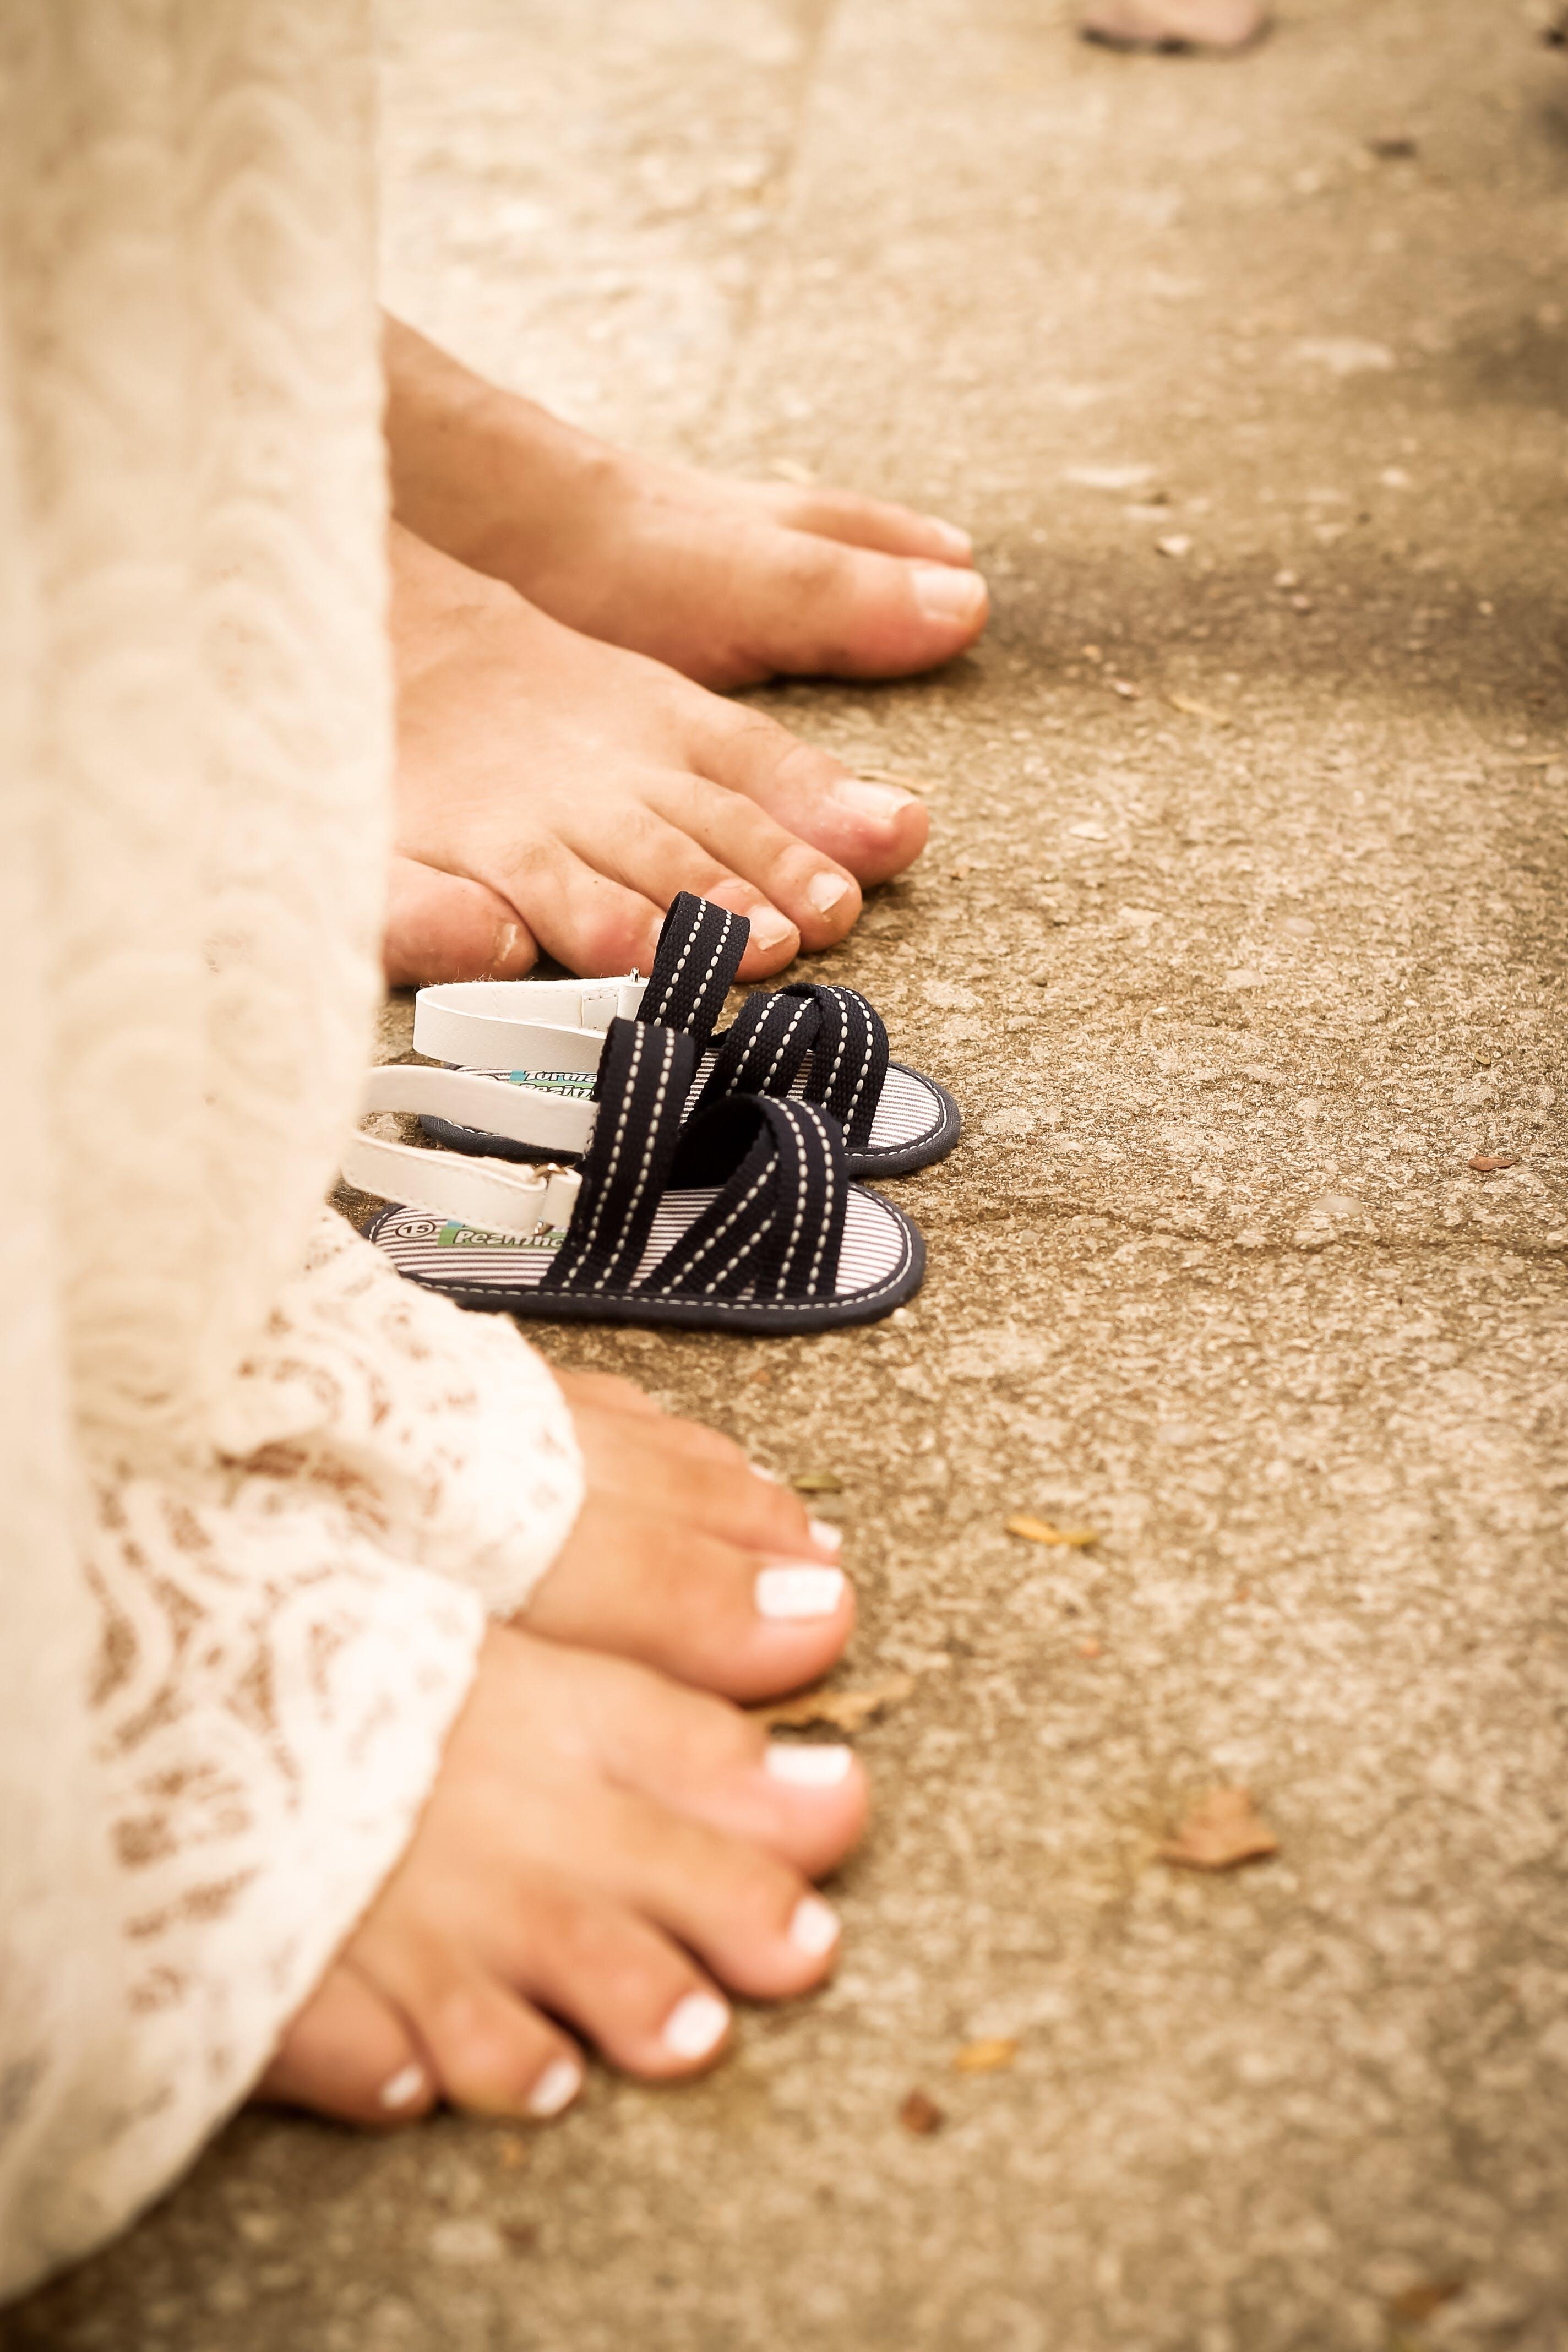 Barefoot People